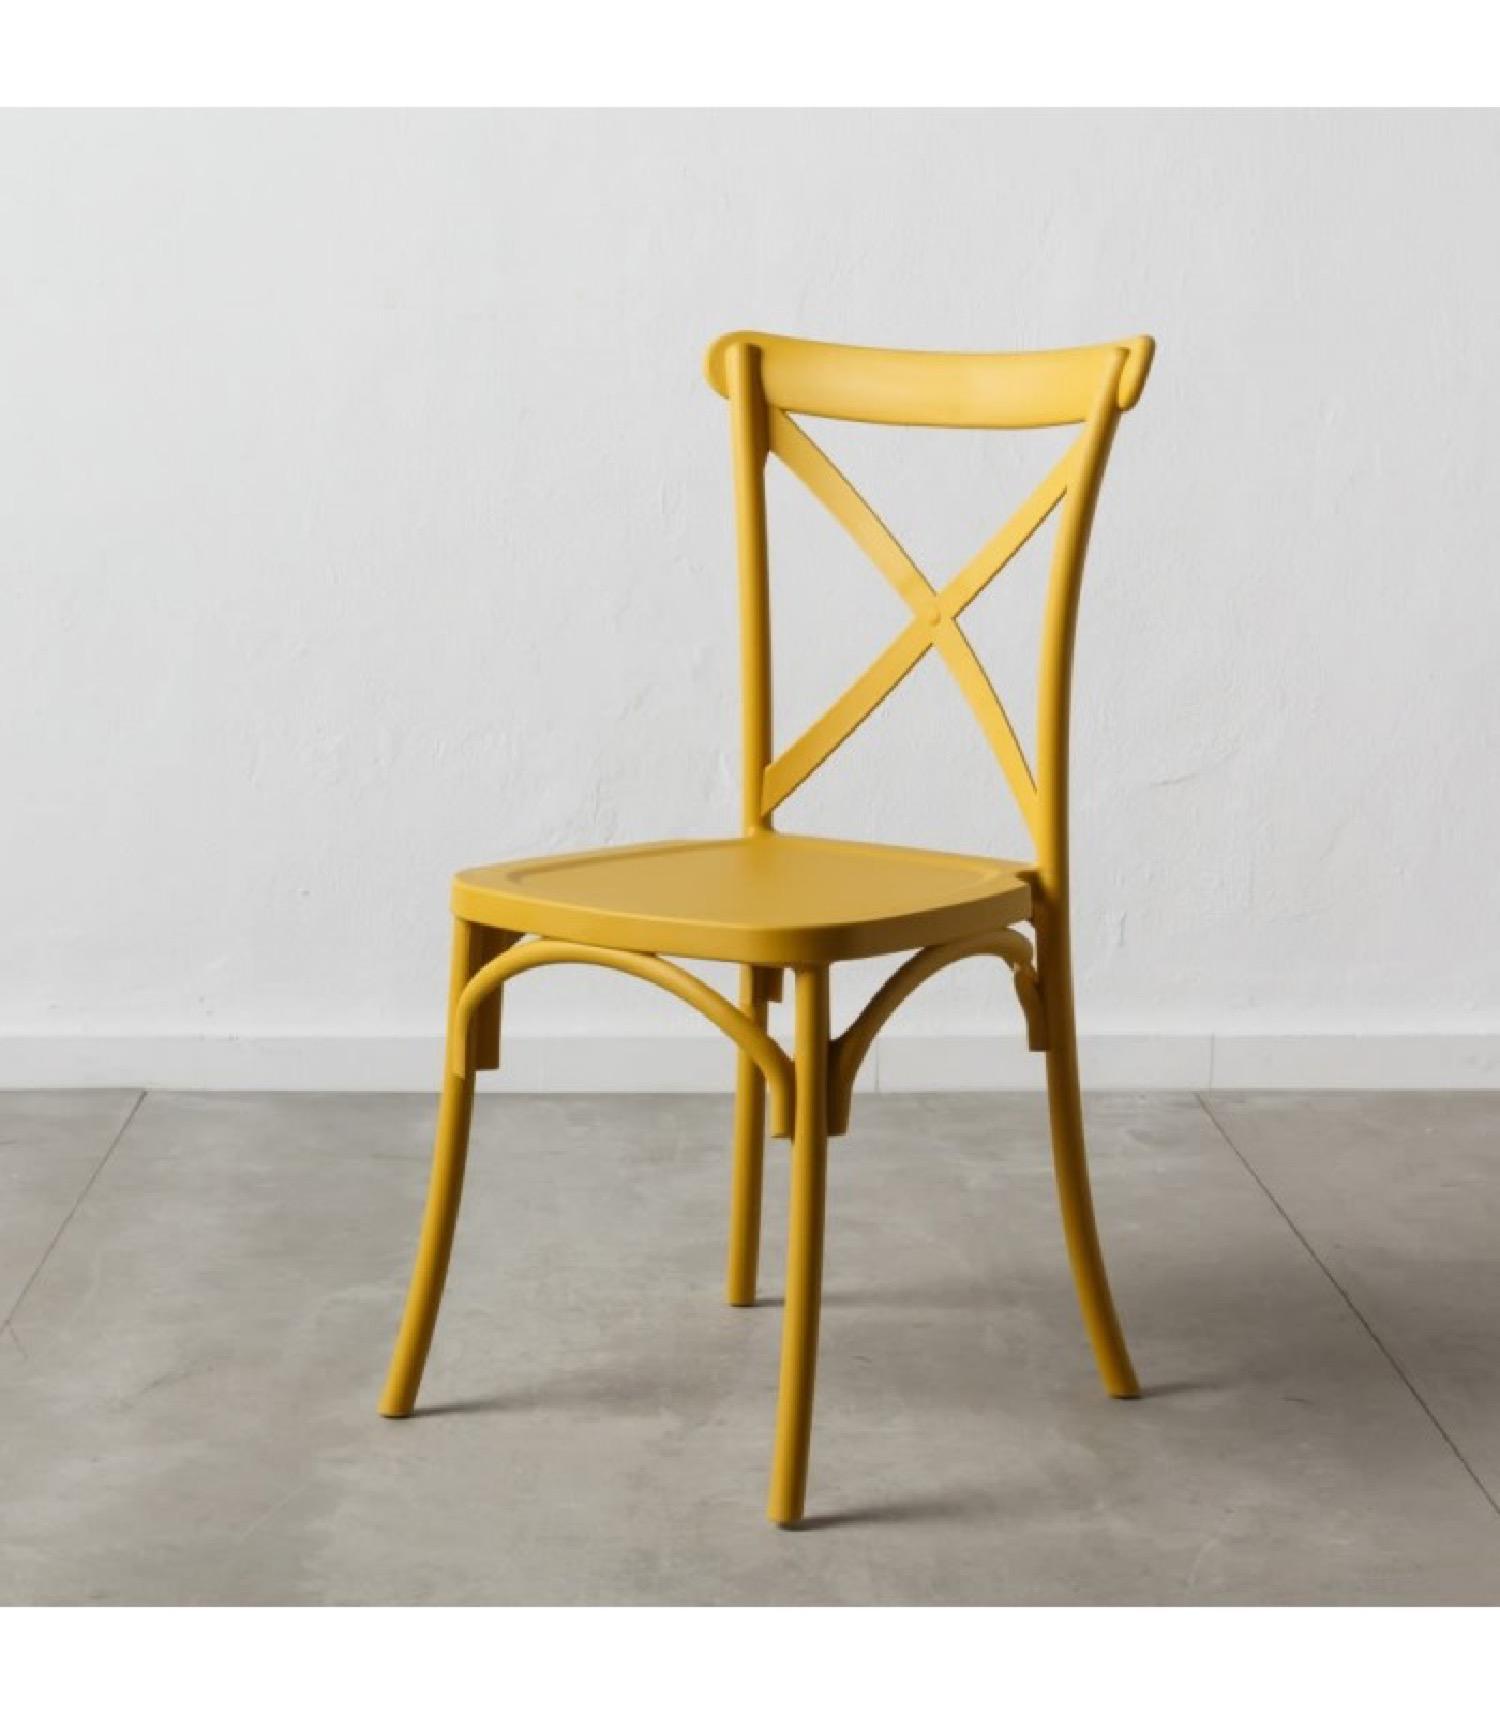 Chaise bistrot en polypropylène jaune